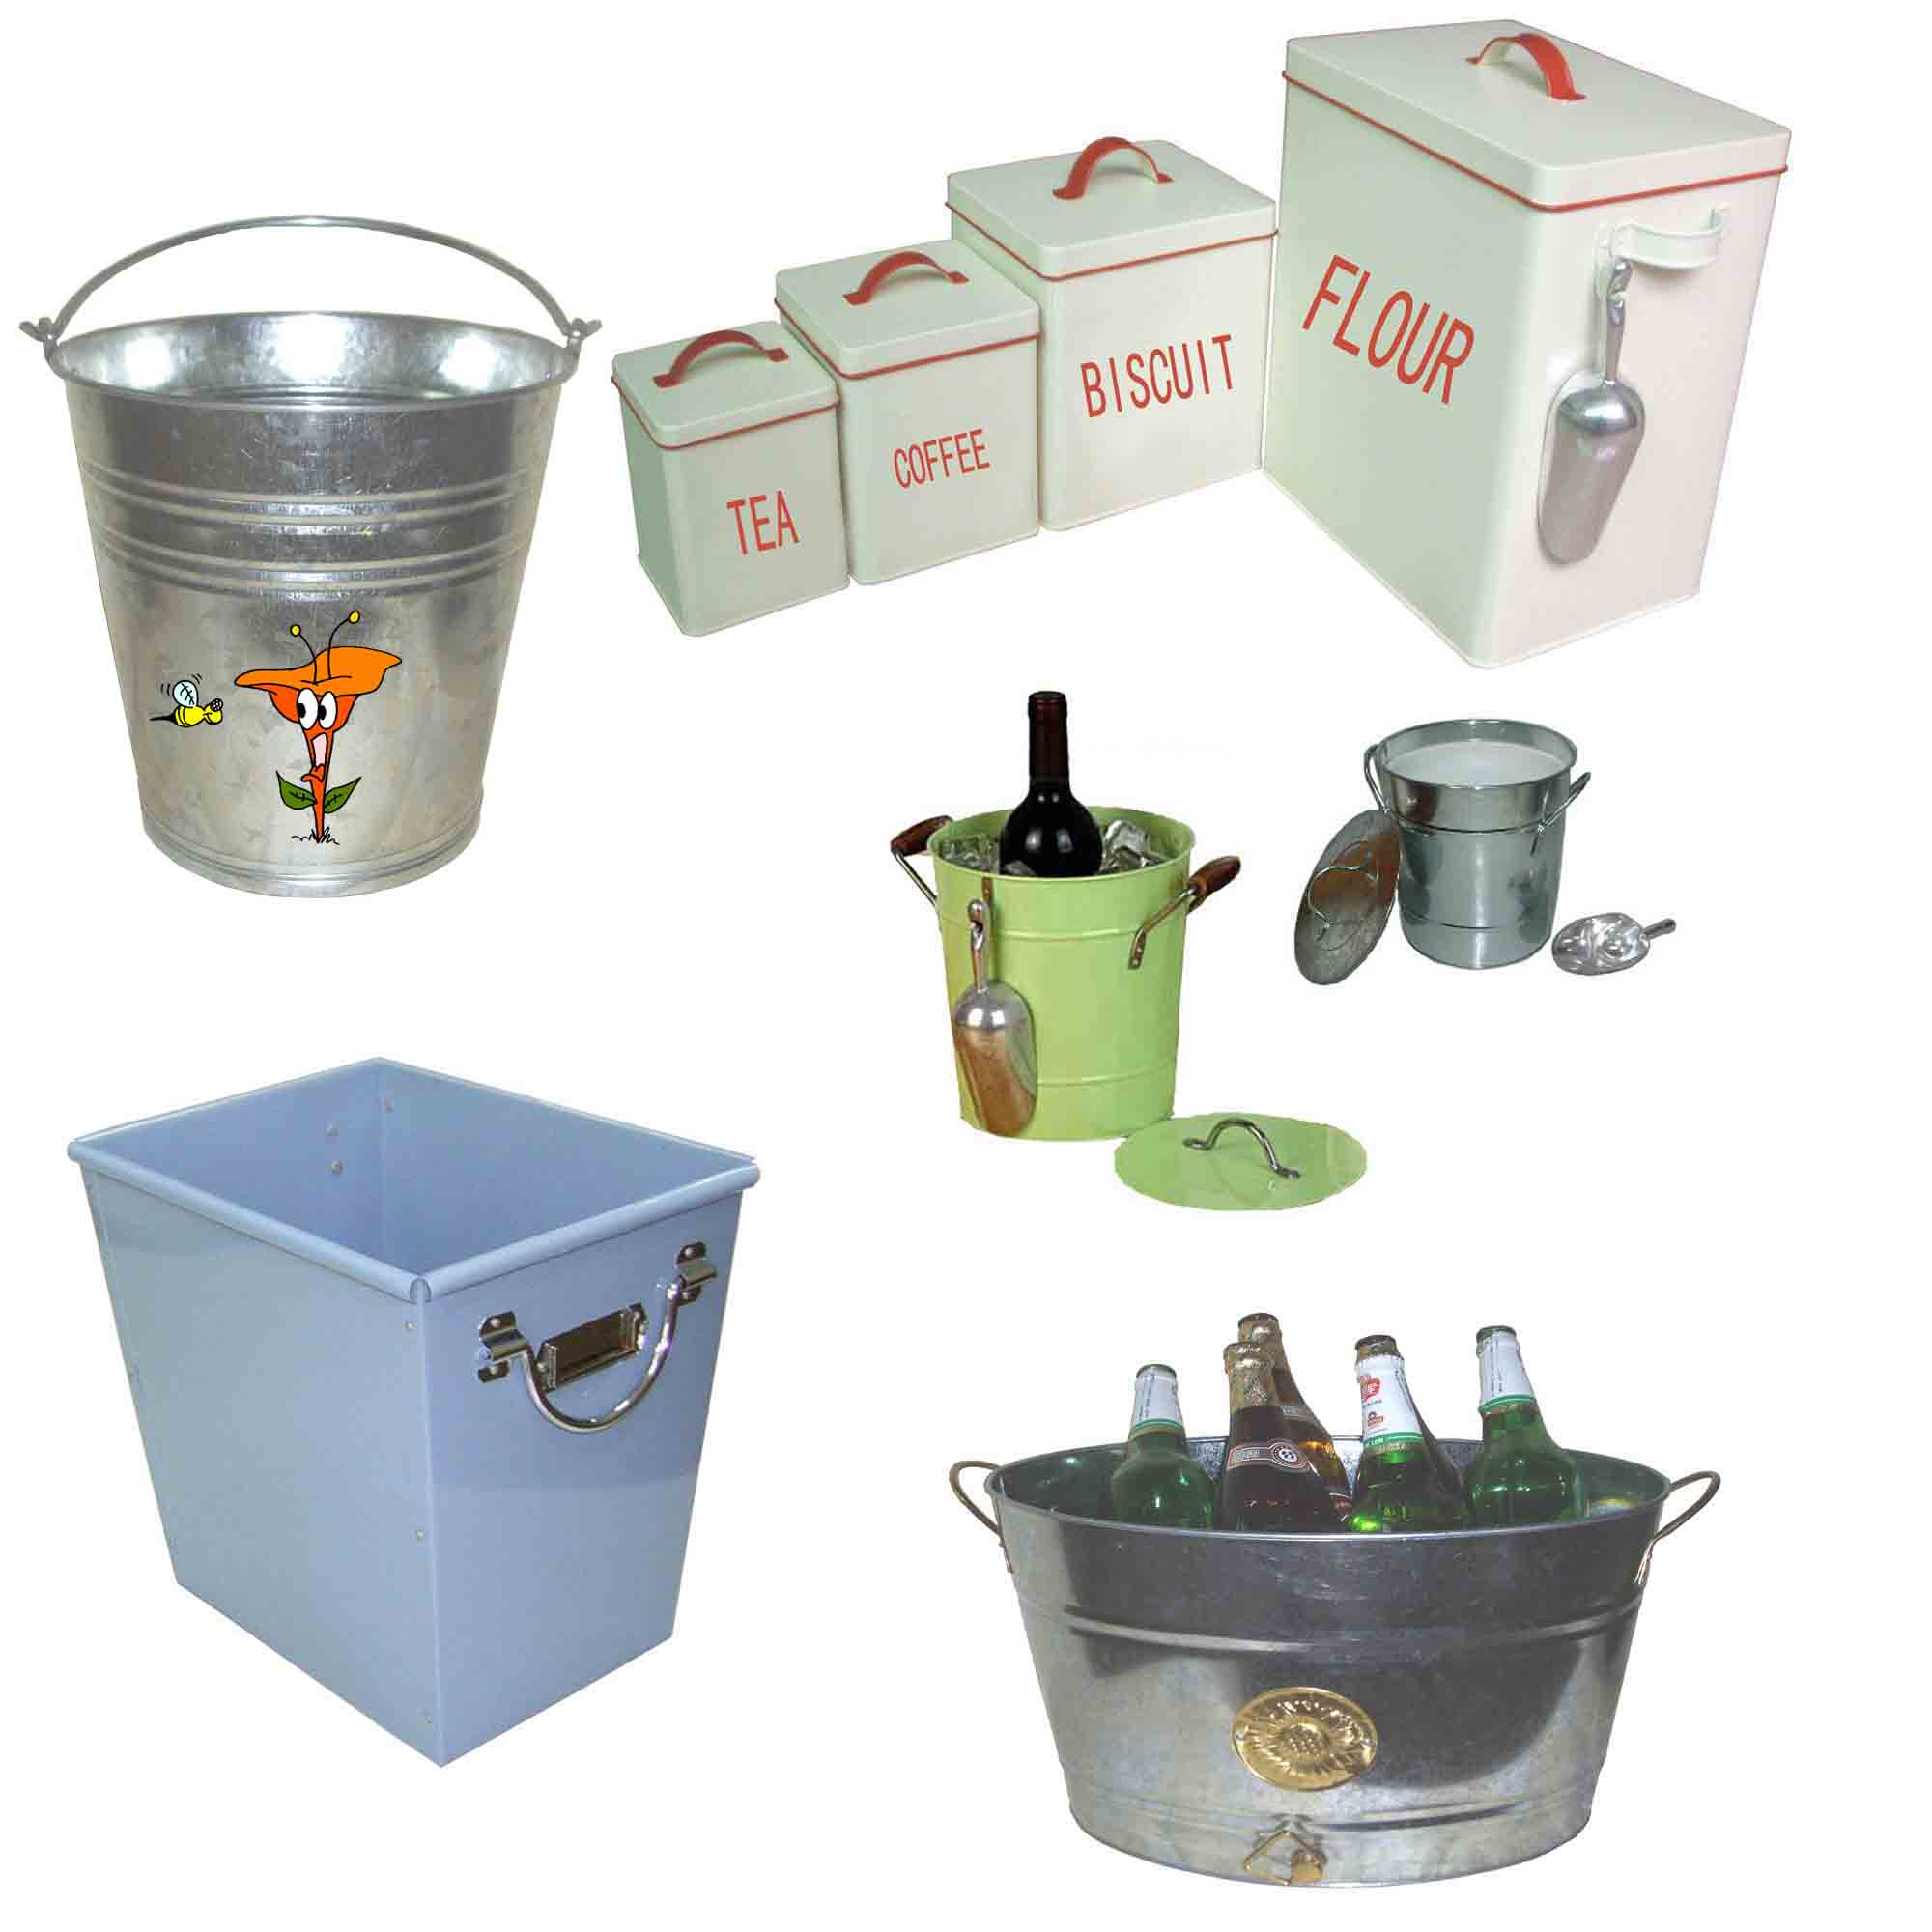 Storage Bin, Gift Box, Tray, Galvanized Tub, Pail (Накопительный бункер, шкатулке, лотки, оцинкованная ванна, ведро)